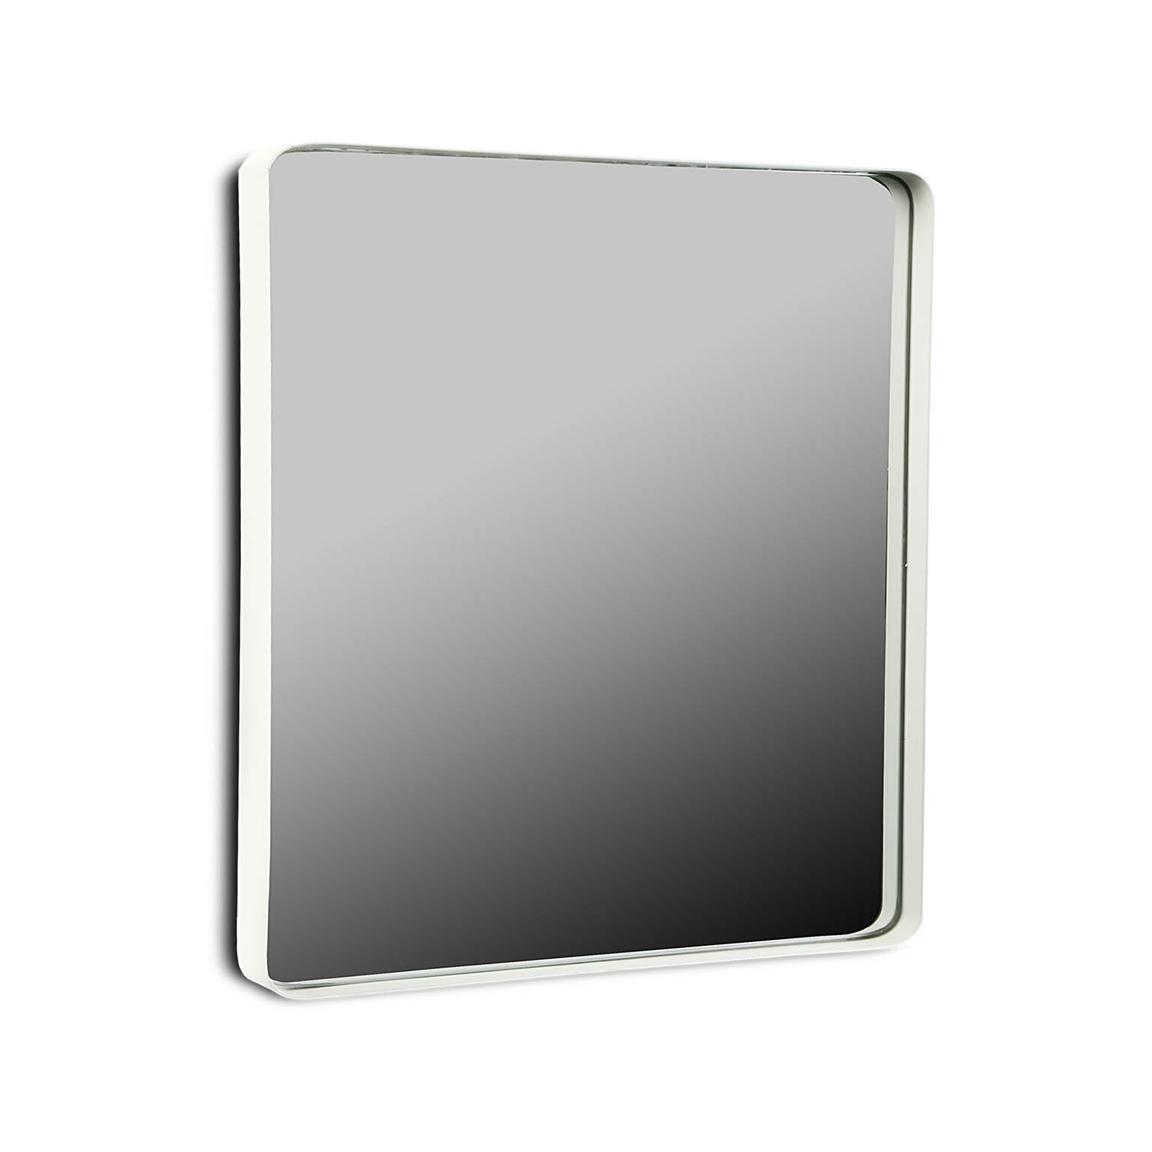 Espejo moderno metalico en for Espejo 60 x 120